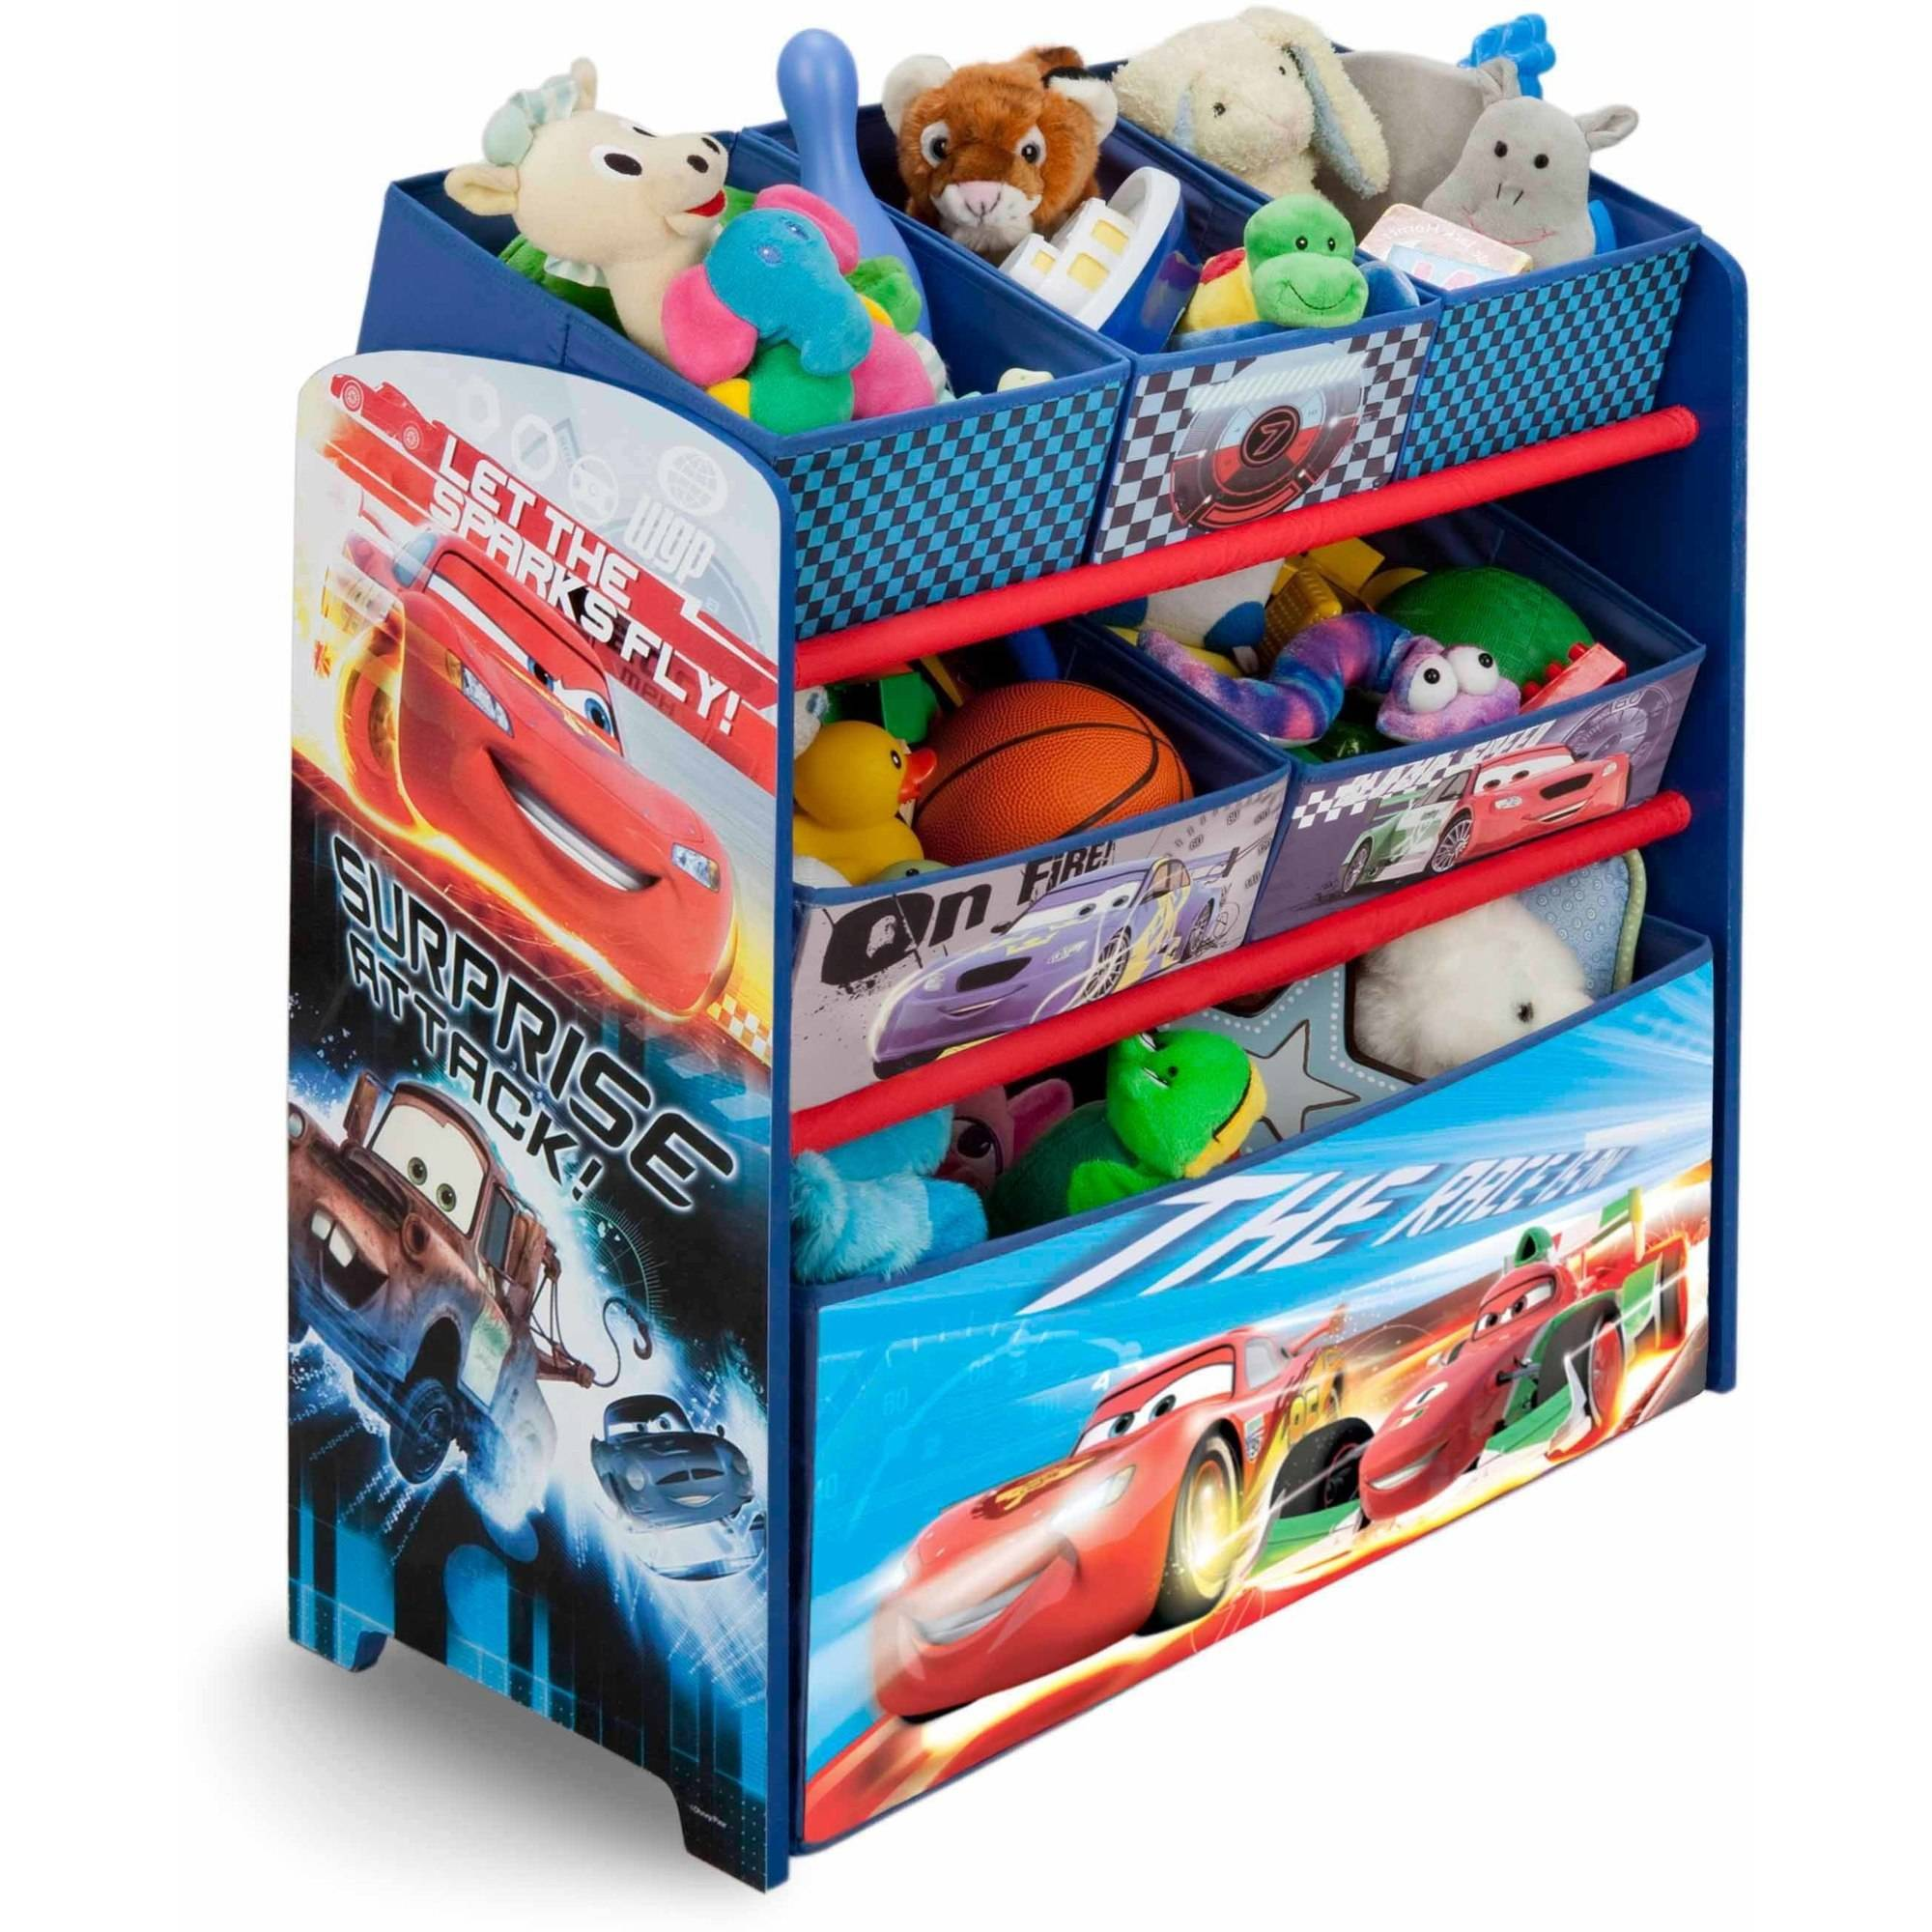 Disney Cars Room-in-a-Box with Bonus Chair - Walmart.com